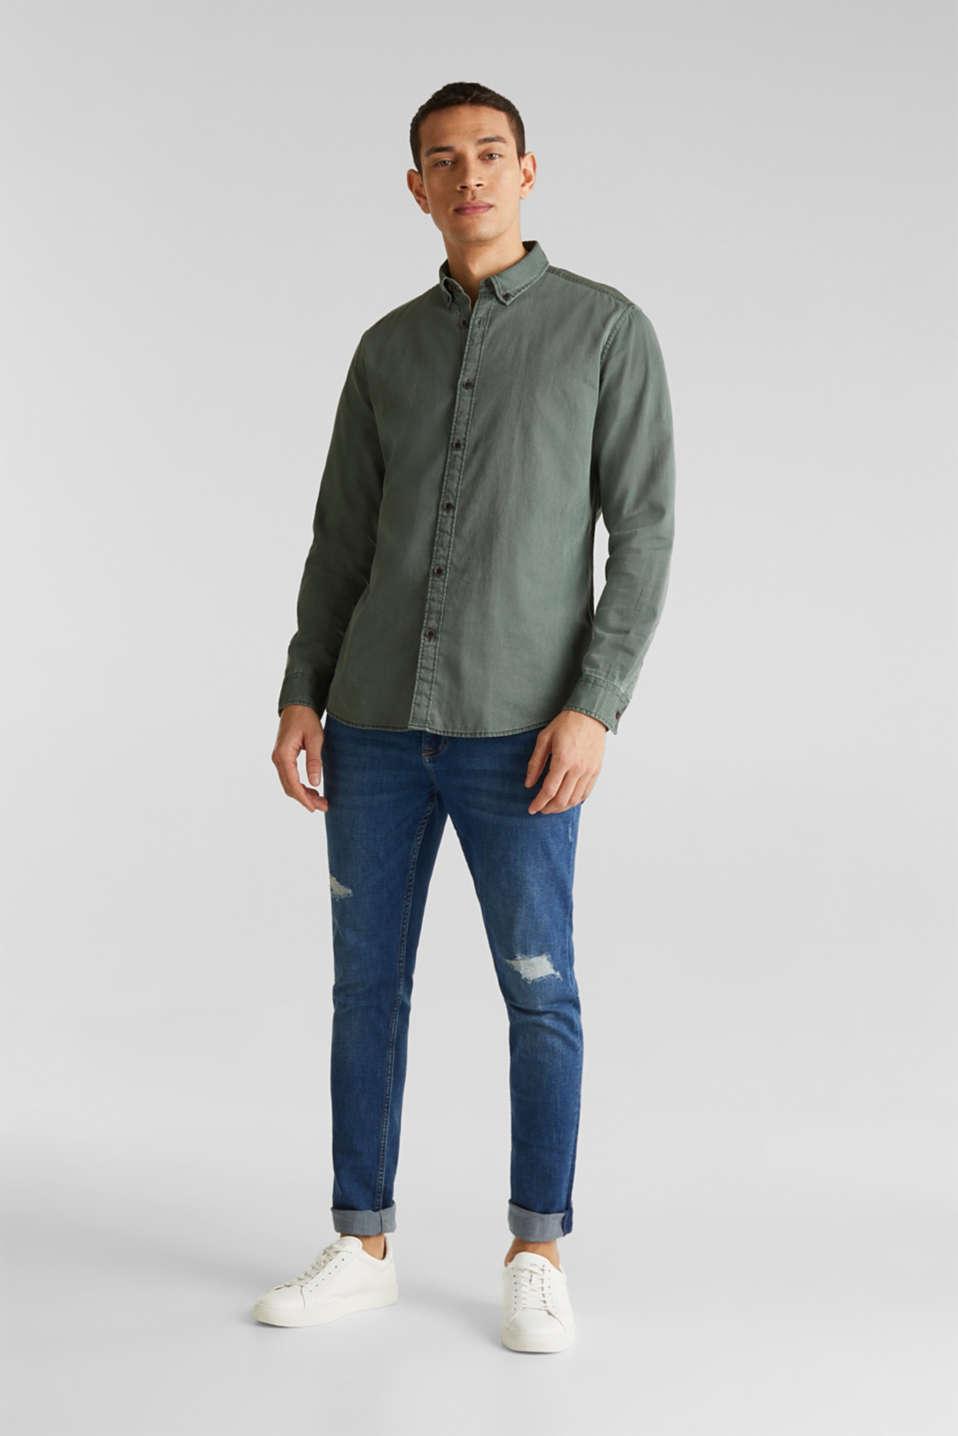 Shirts woven Slim fit, KHAKI GREEN 5, detail image number 7